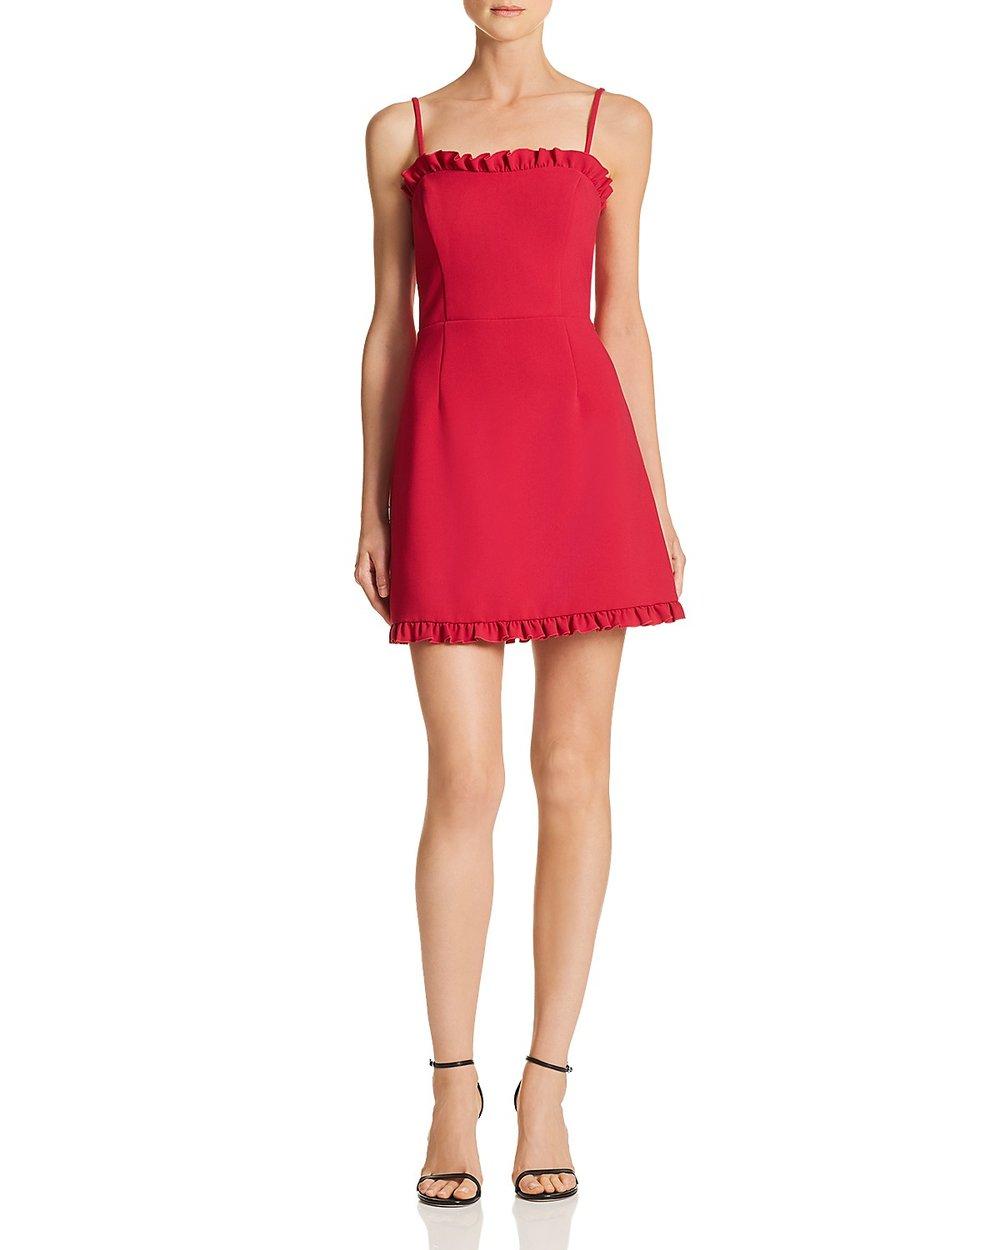 Simple & elegant- shop this red dress at  Bloomingdales .